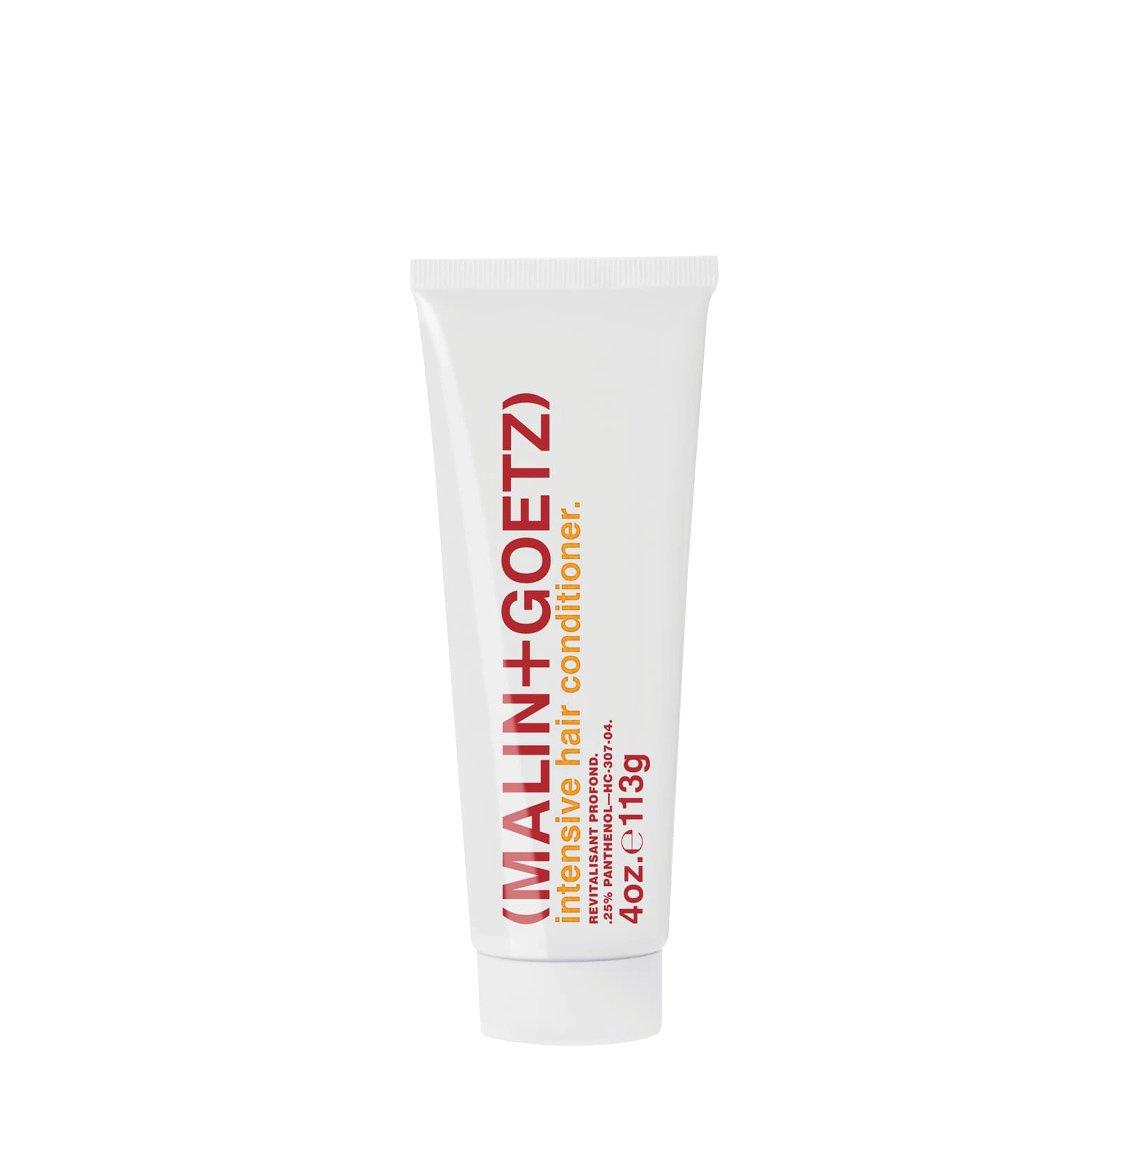 Malin and Goetz Intensive Hair Conditioner Revitalisant Profond 113g